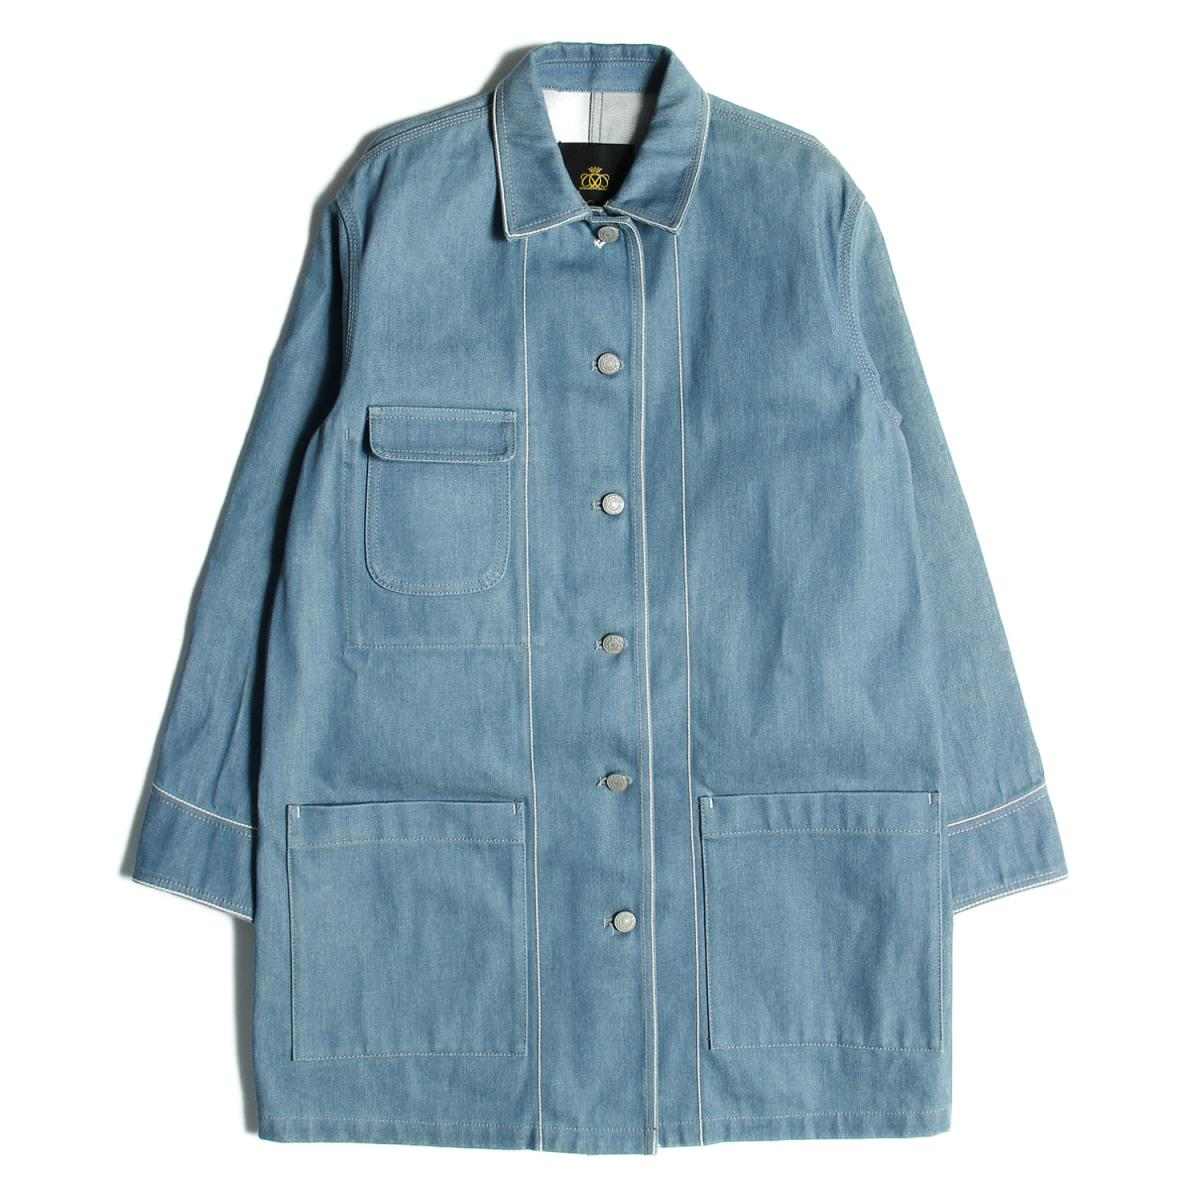 Drawer(ドゥロワー) SELVAGEDENIMカバーオール ジャケット ブルー 38(M) 【レディース】【中古】【美品】【K2299】